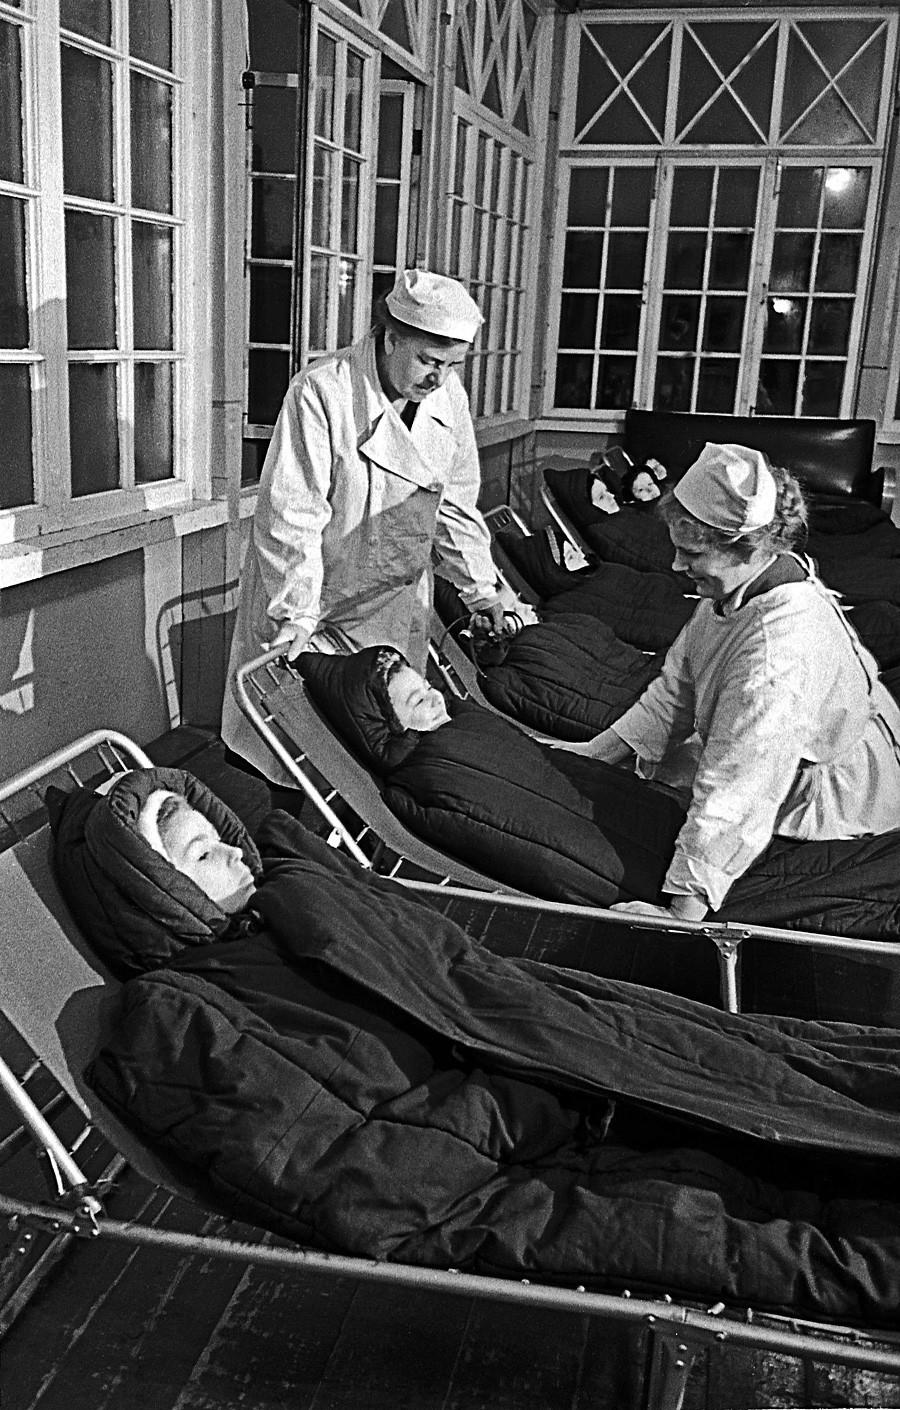 Otroci v sanatoriju v Karelijski ožini, ZSSR, 1959